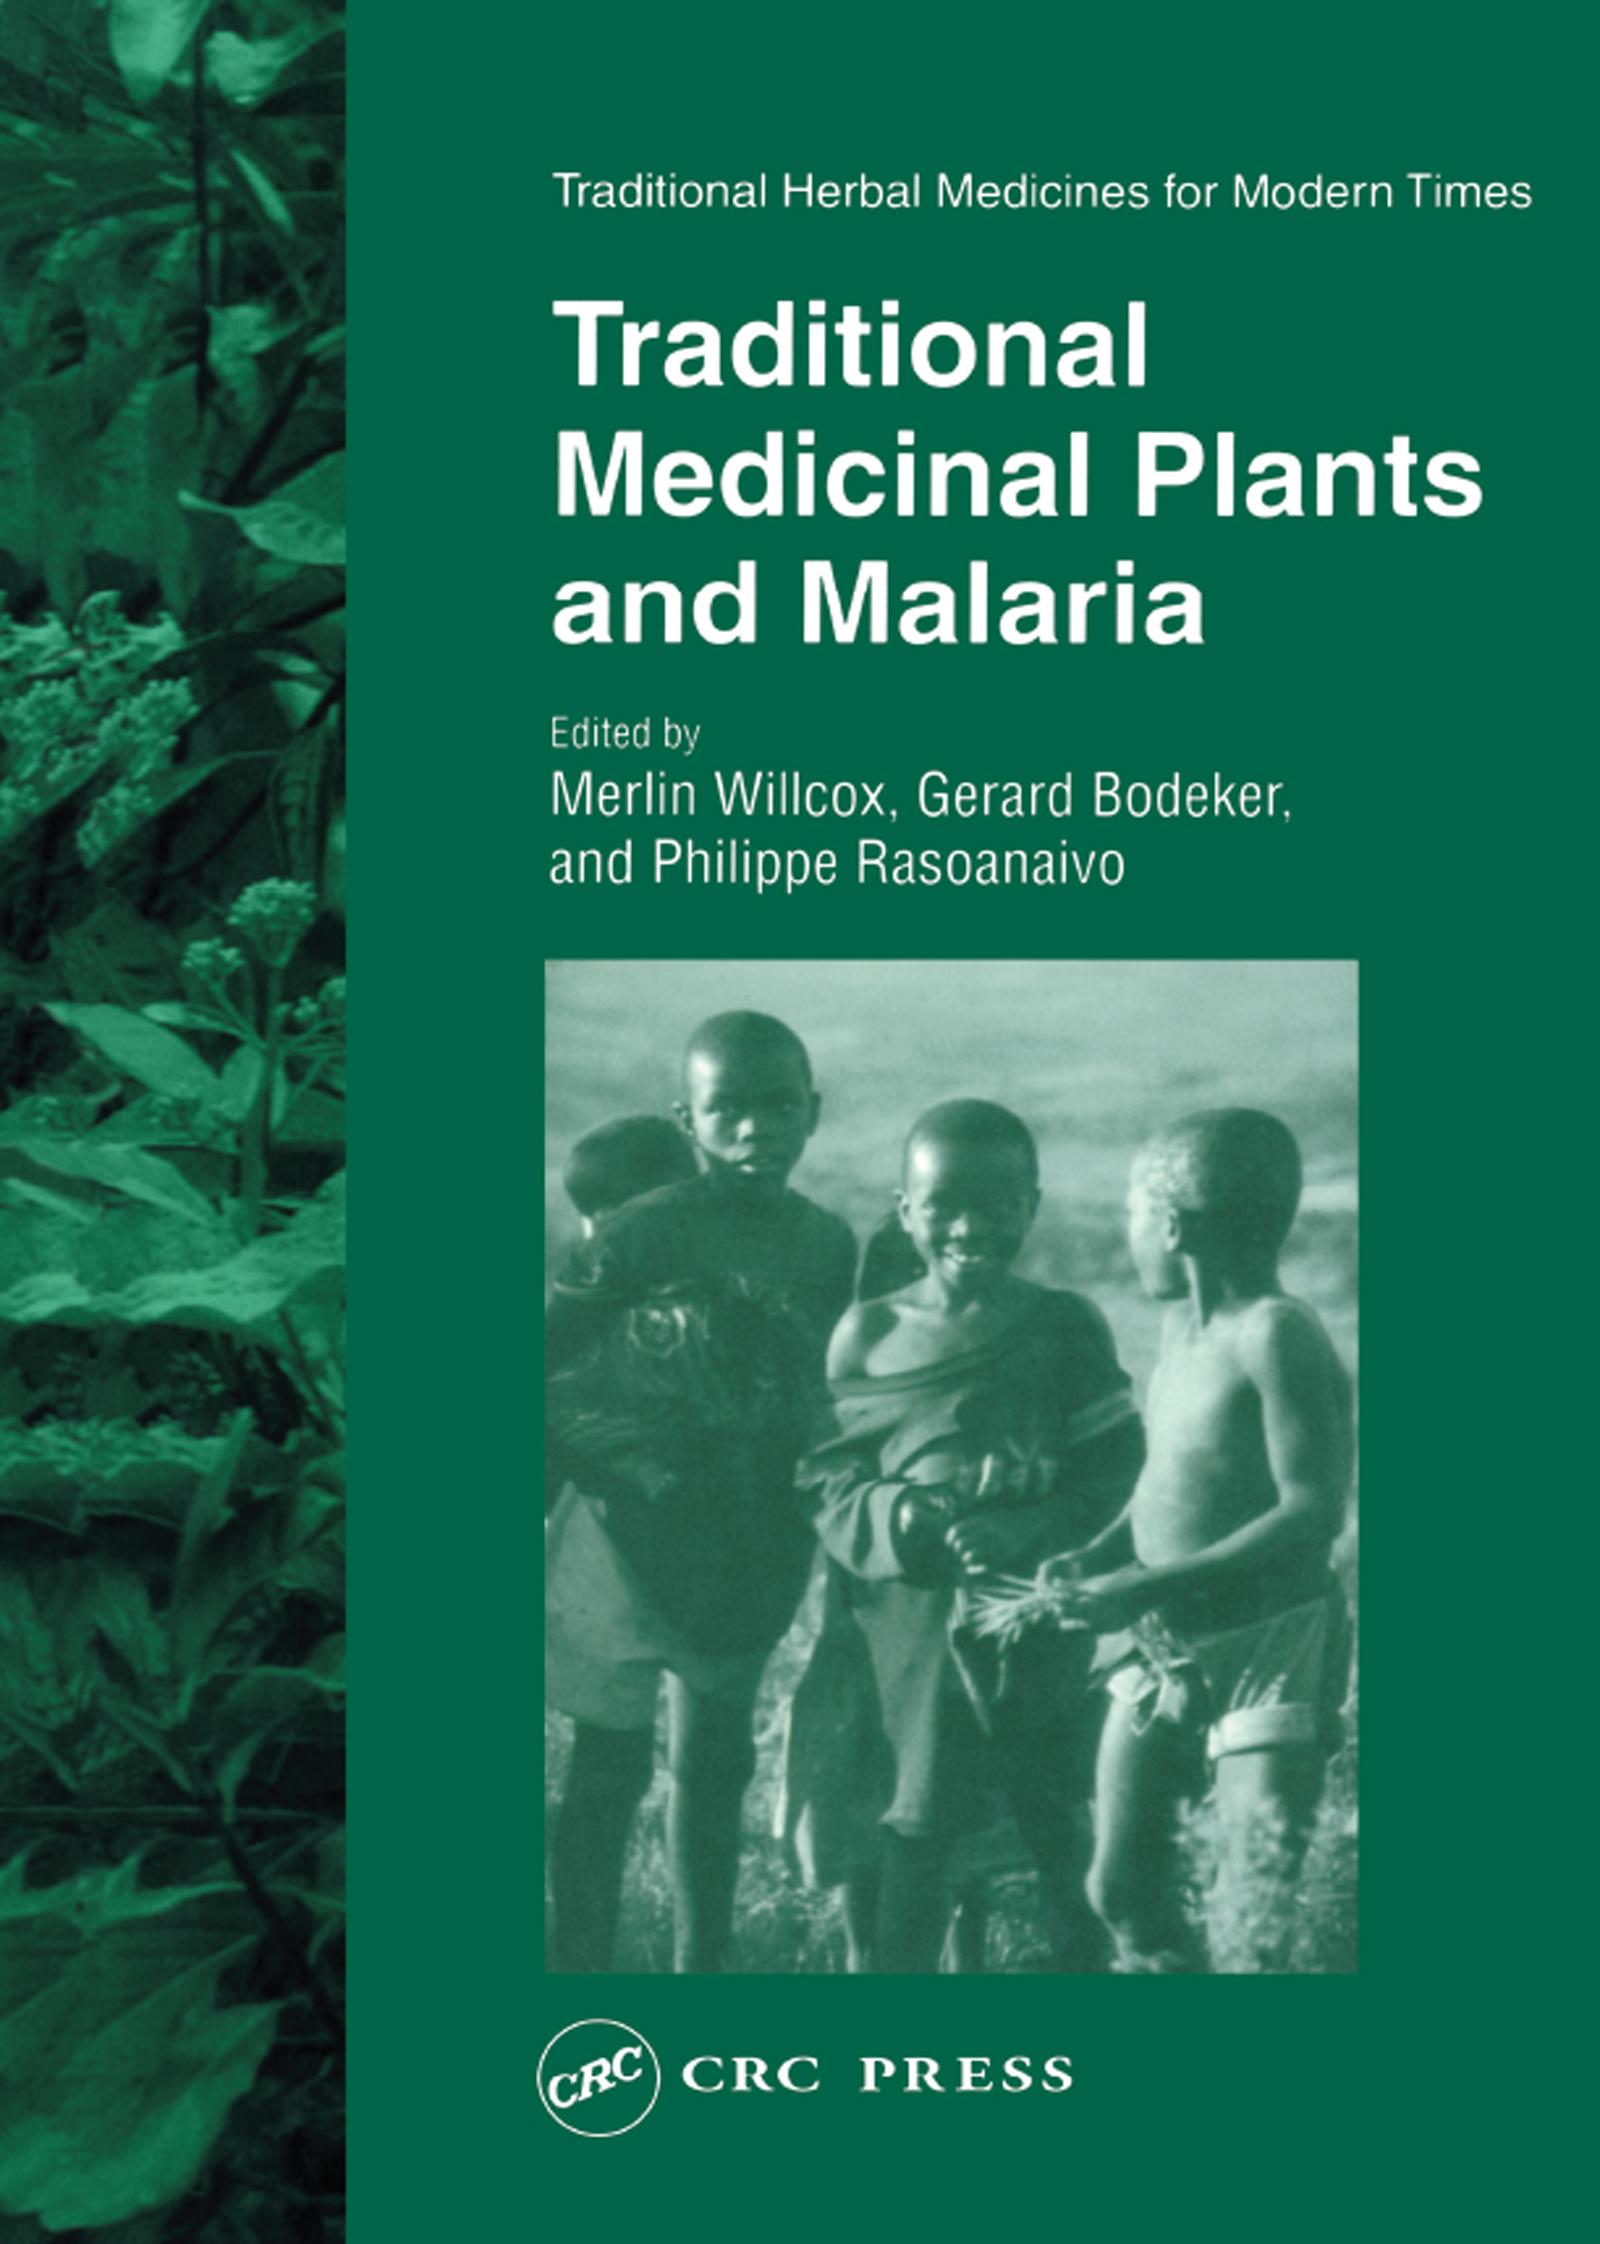 Traditional Medicinal Plants and Malaria: 1st Edition (Hardback) book cover